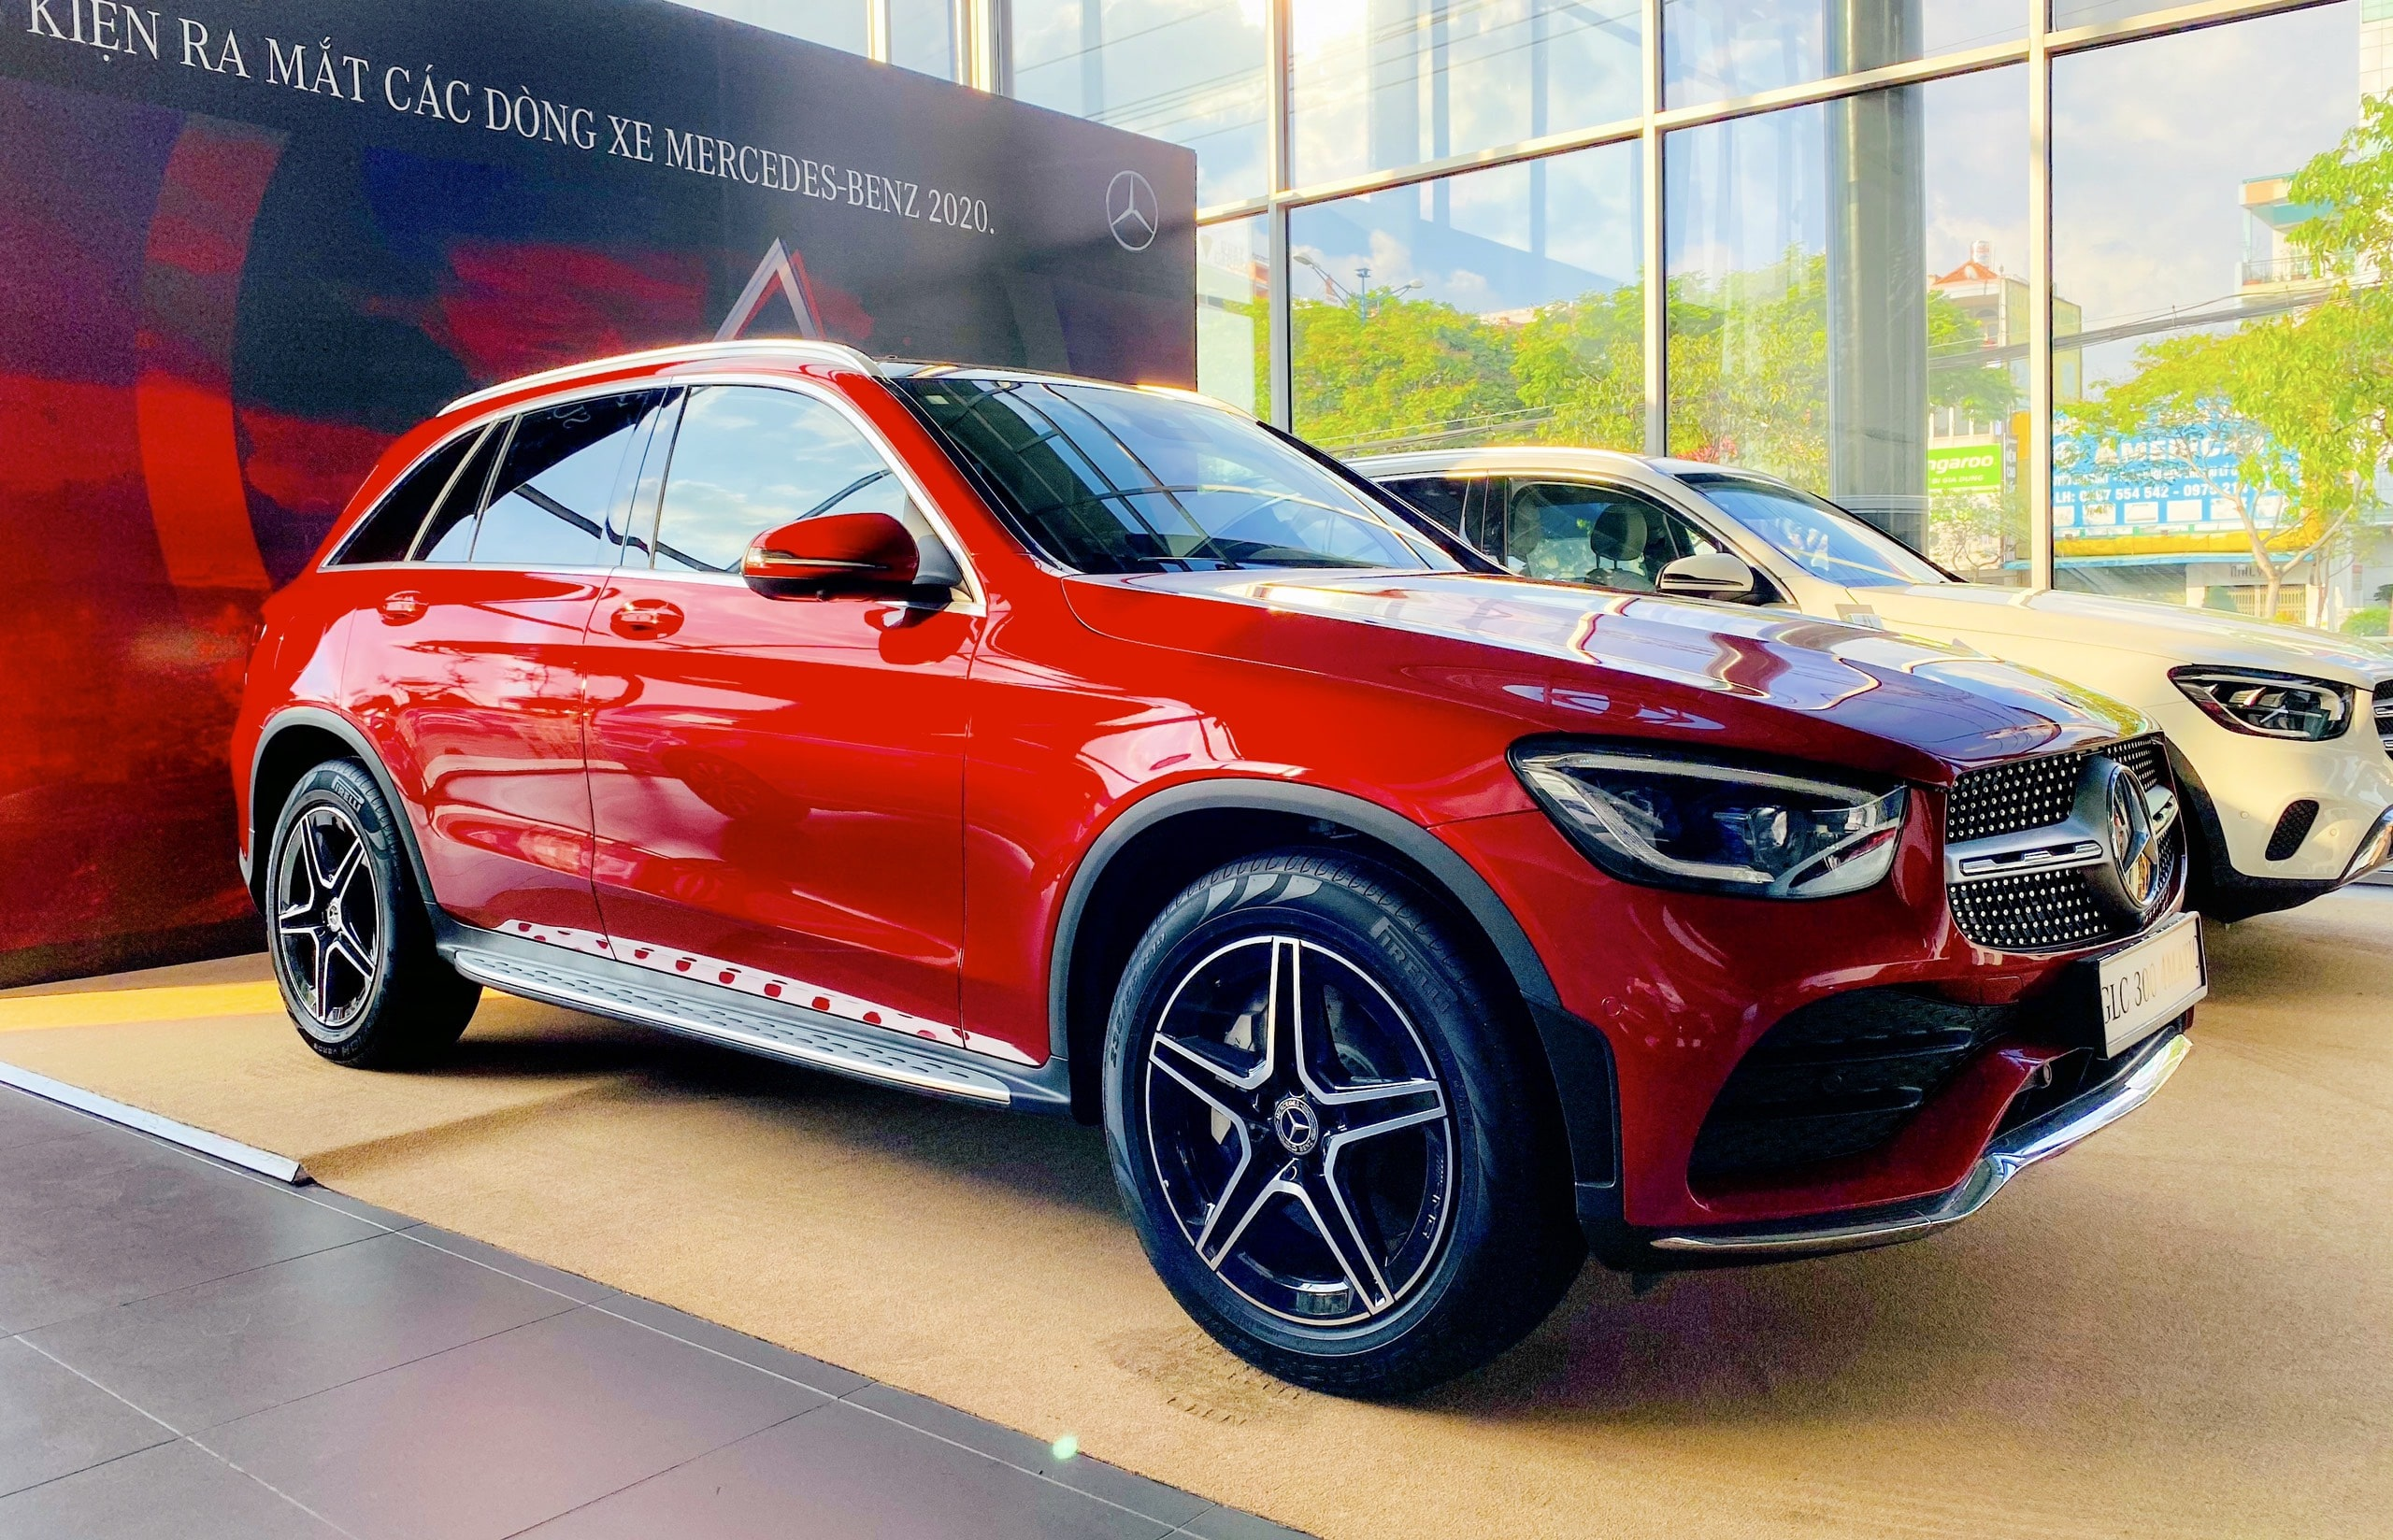 Mercedes GLC 300 4Matic 2022